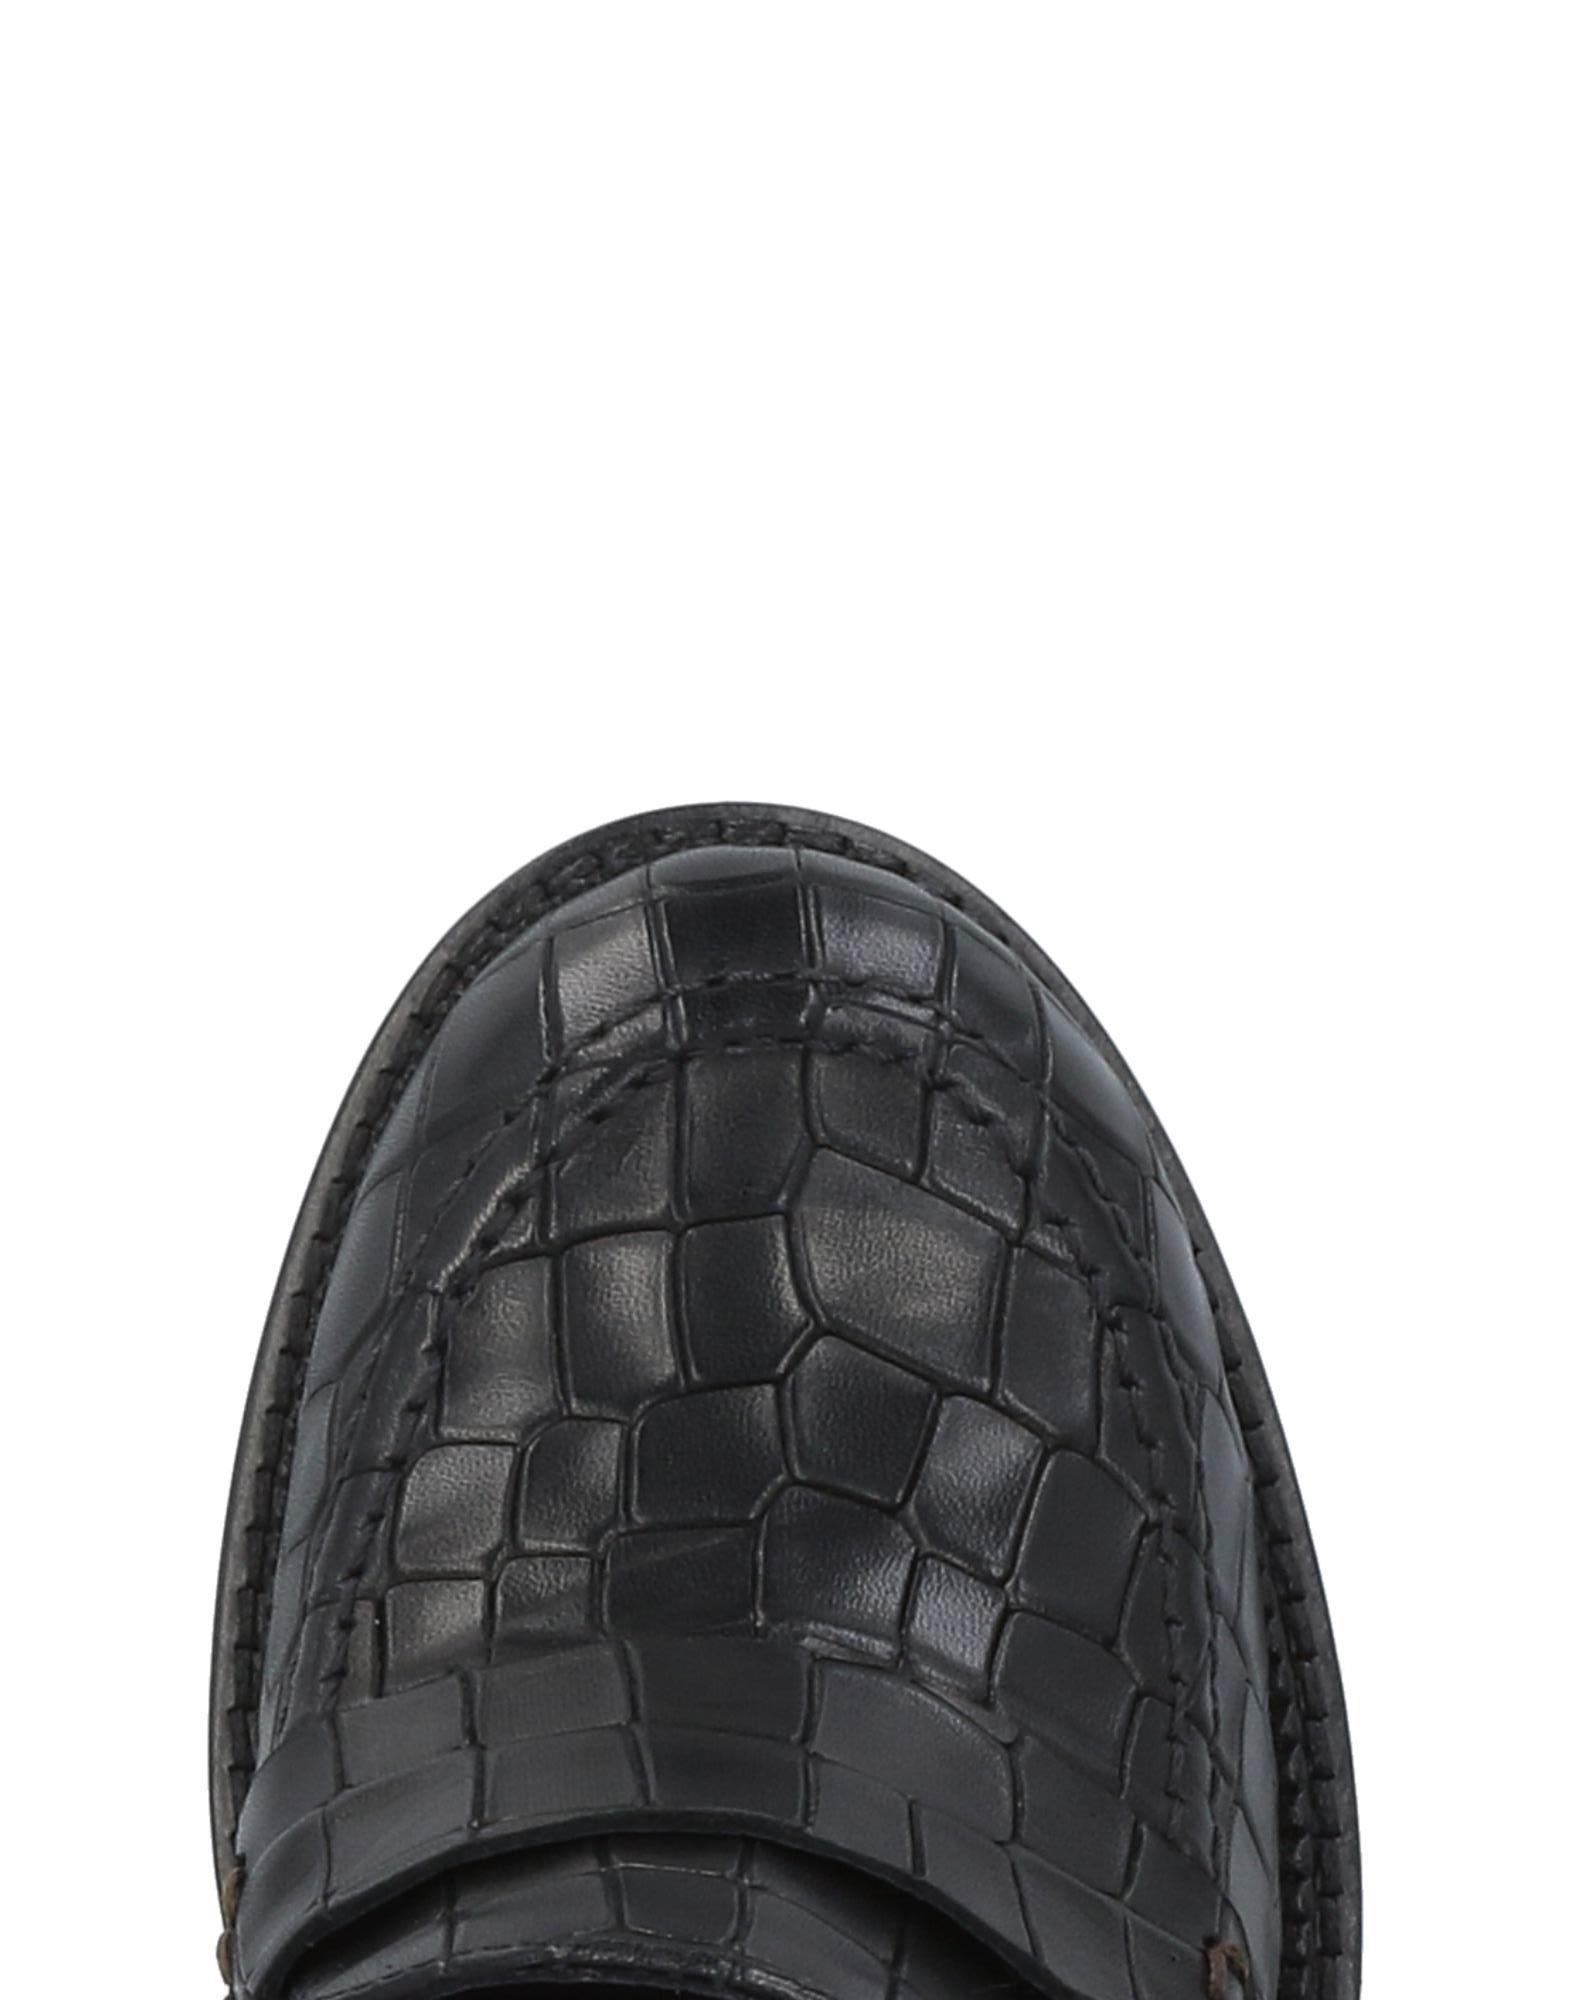 Tangerine Mokassins Damen  11473157VL Gute Qualität beliebte Schuhe